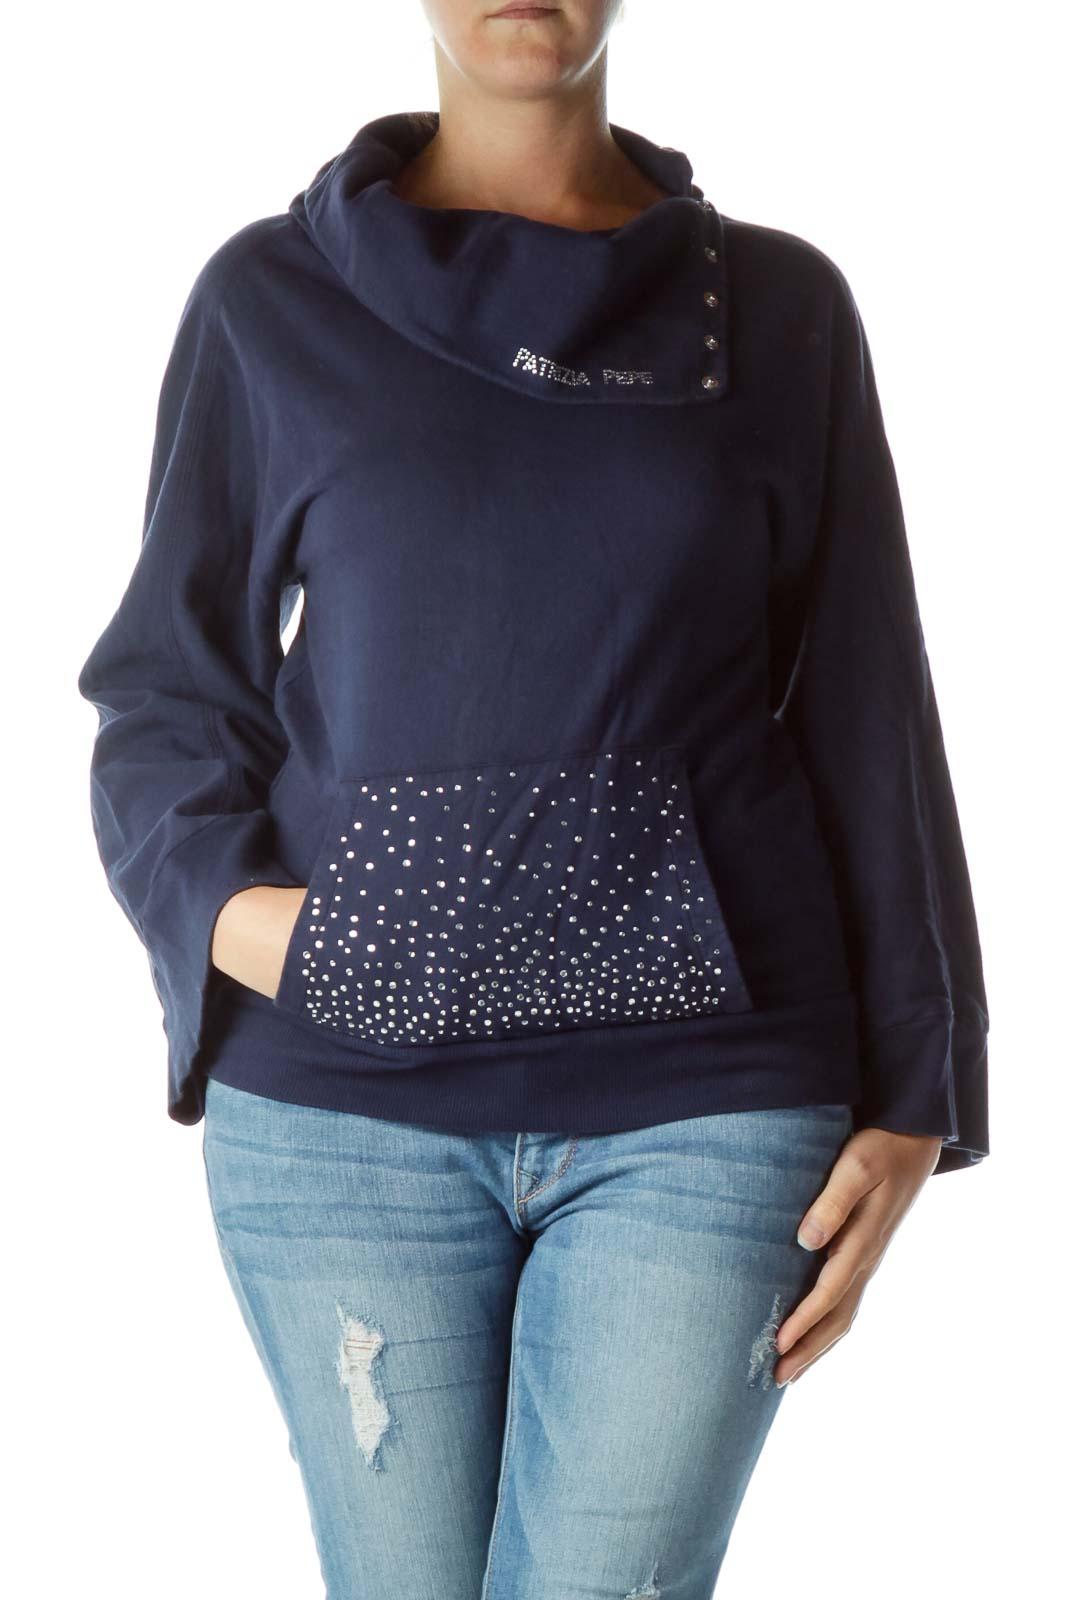 Navy Silver Gemstone Sweater